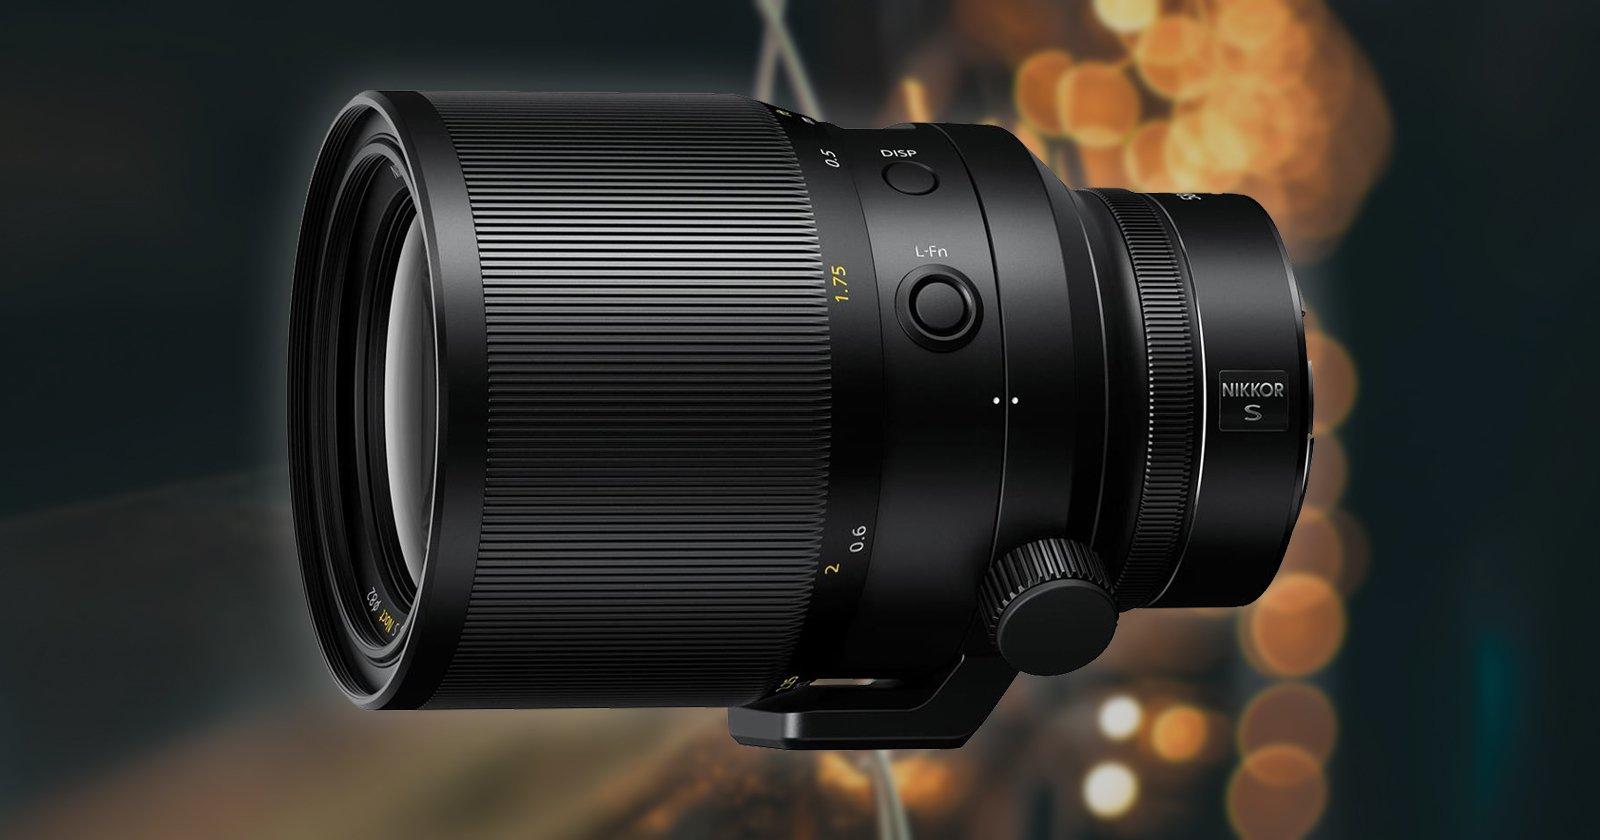 Nikon: Adding Autofocus to the Noct Lens Would Increase Size 'Far Beyond Imagination'